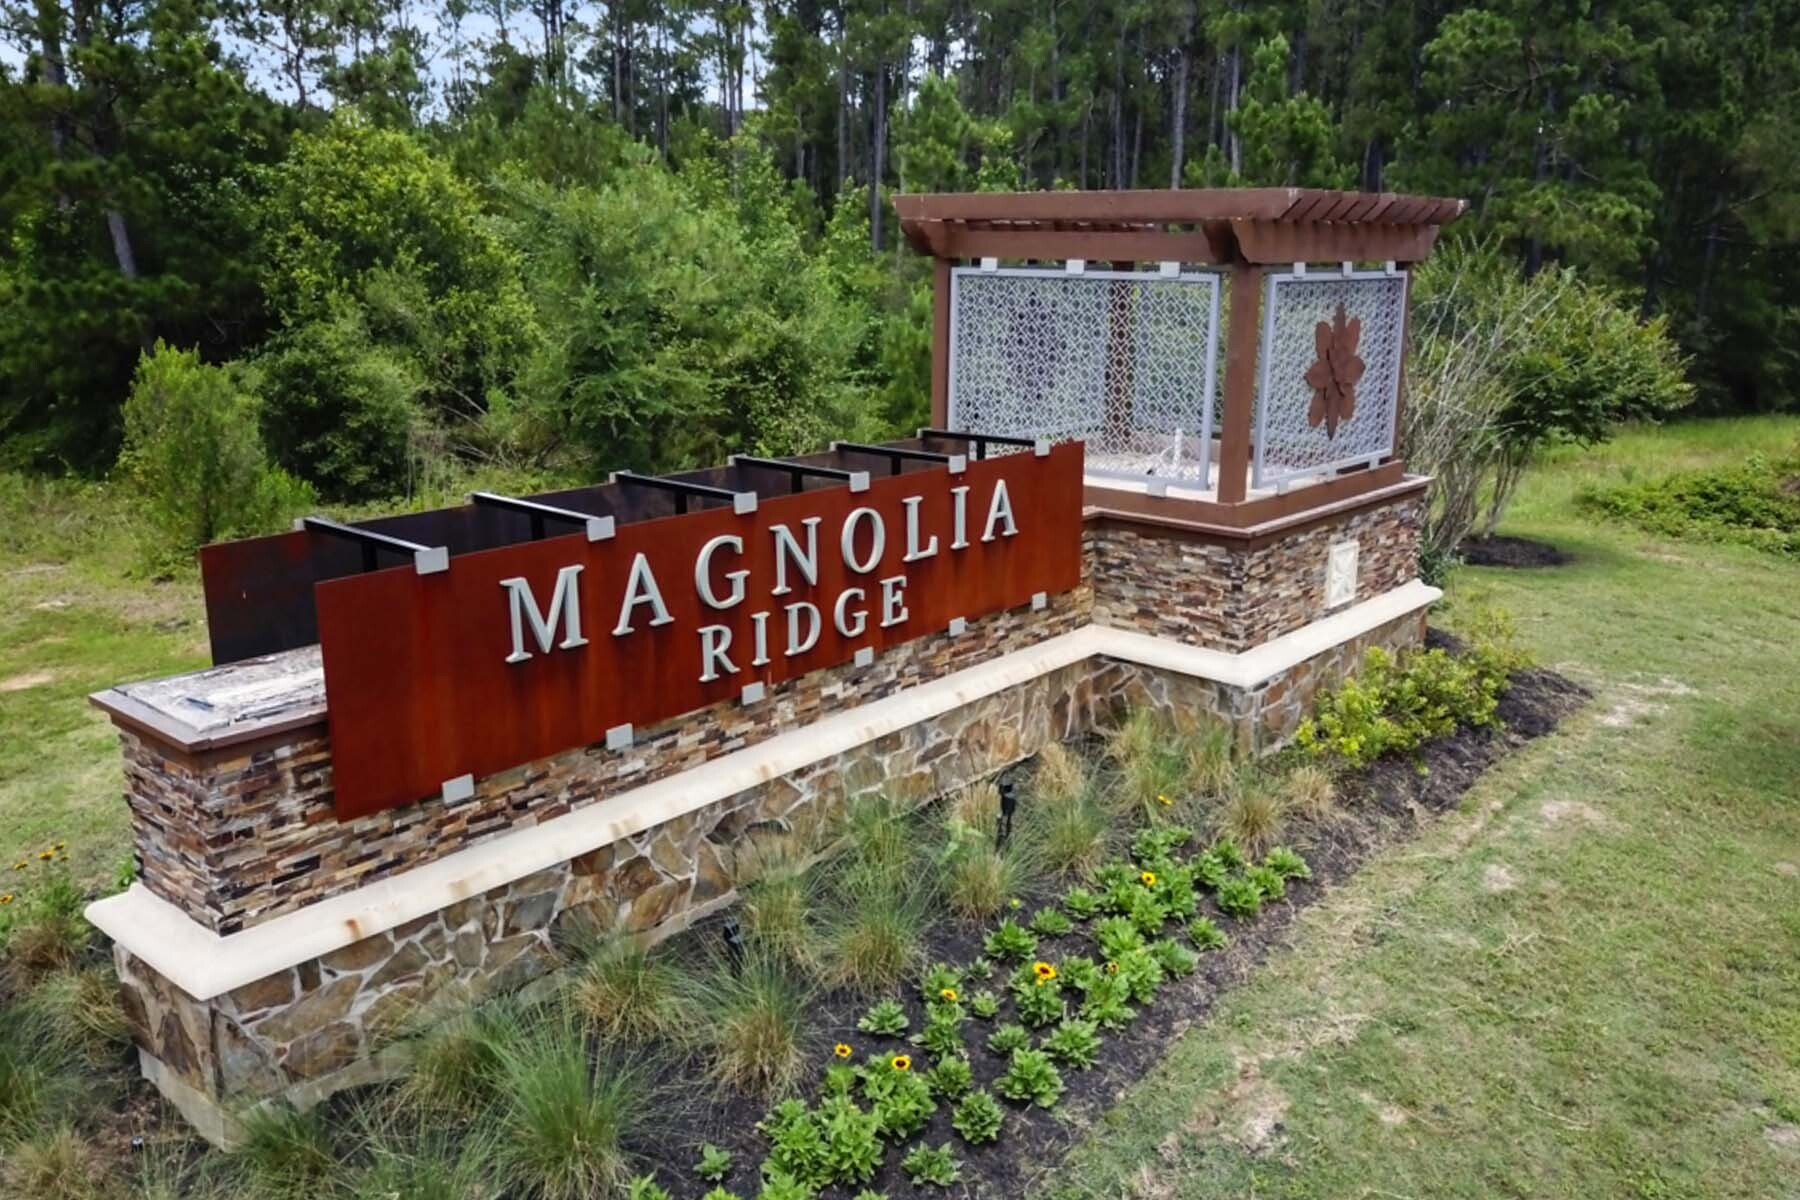 Magnolia Ridge Entrance